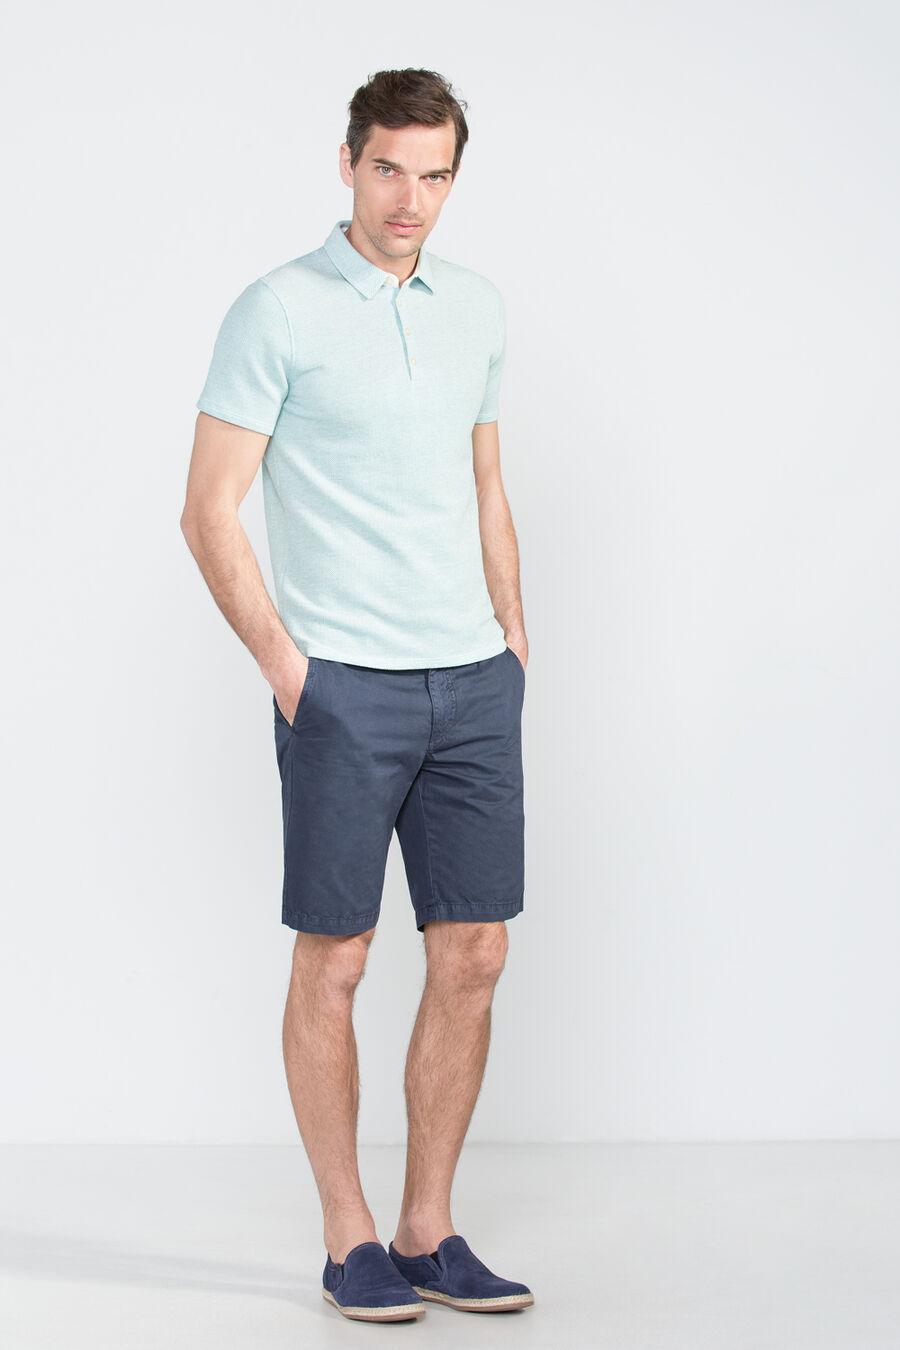 Dye-in bermuda shorts